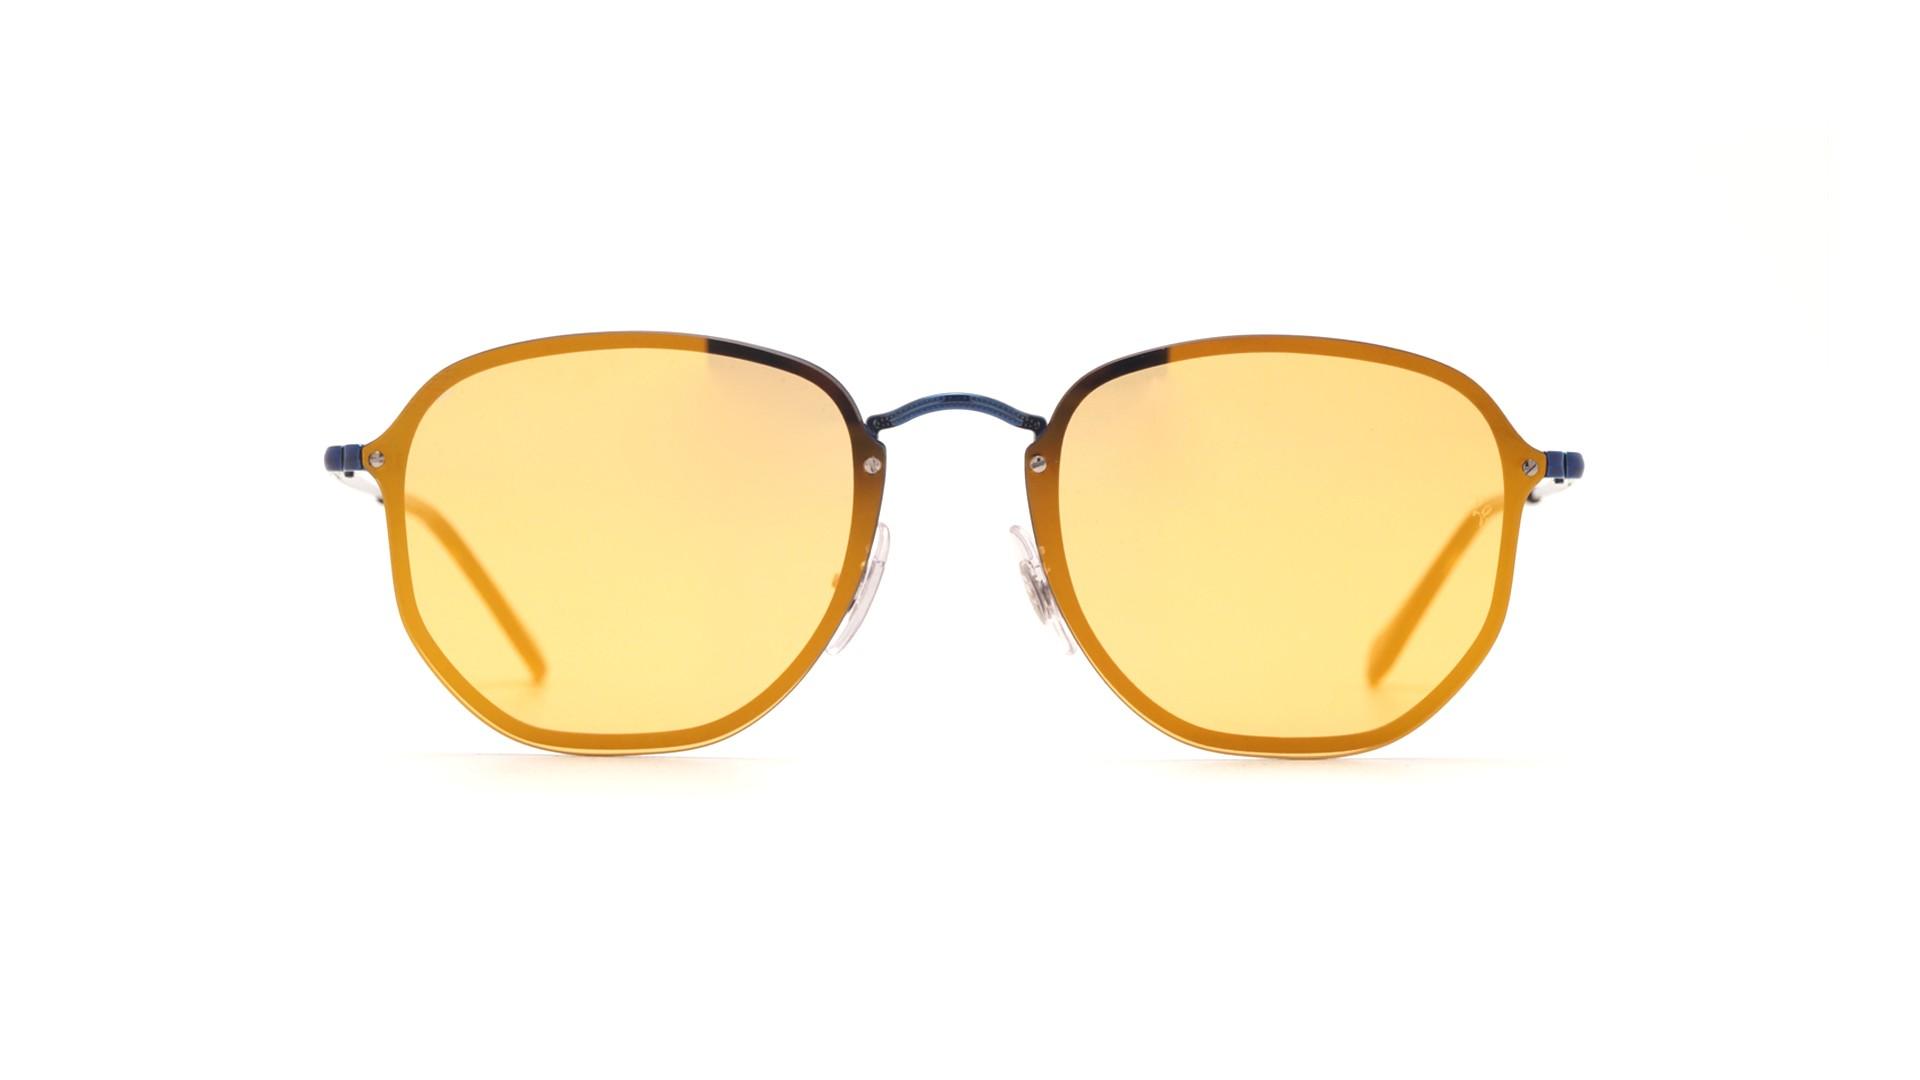 cdd61724479 Sunglasses Ray-Ban Hexagonal Blaze Blue RB3579N 90387J 58-15 Large Mirror